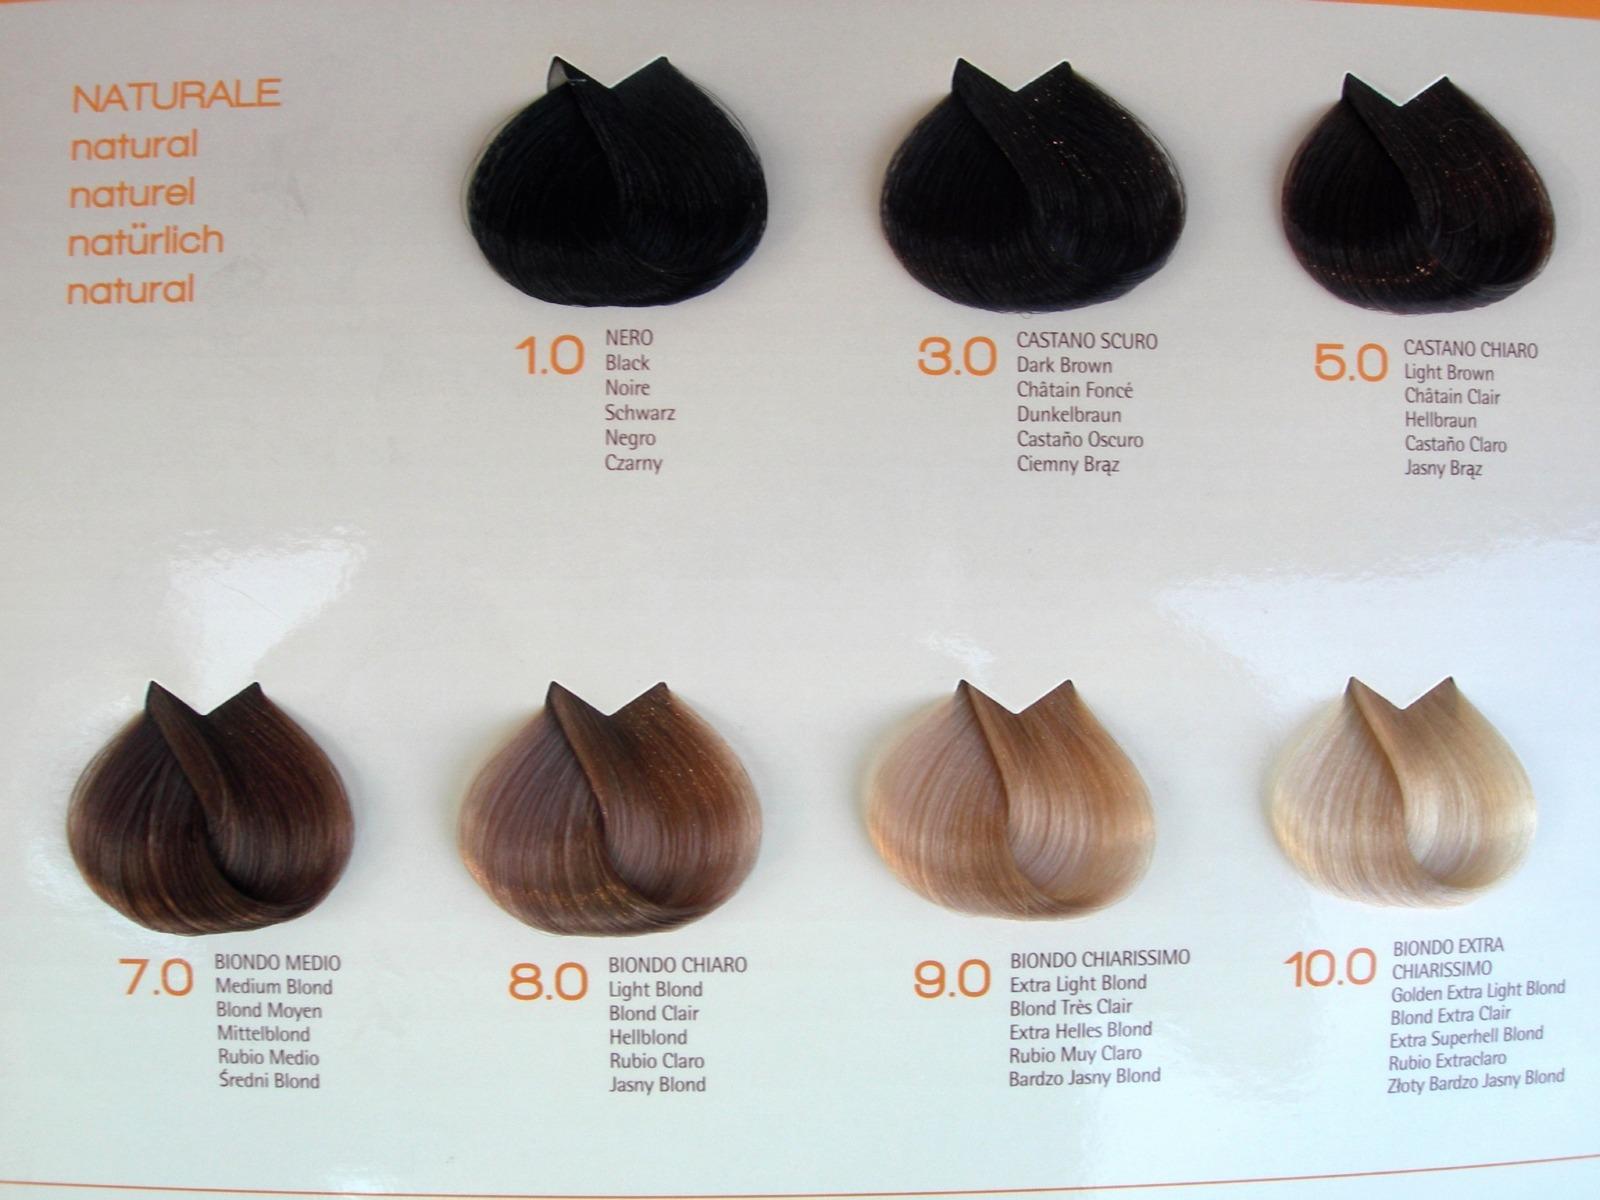 Linea Biokap (capelli) / Tinta / Nutricolor / Biokap Tinta per Capelli